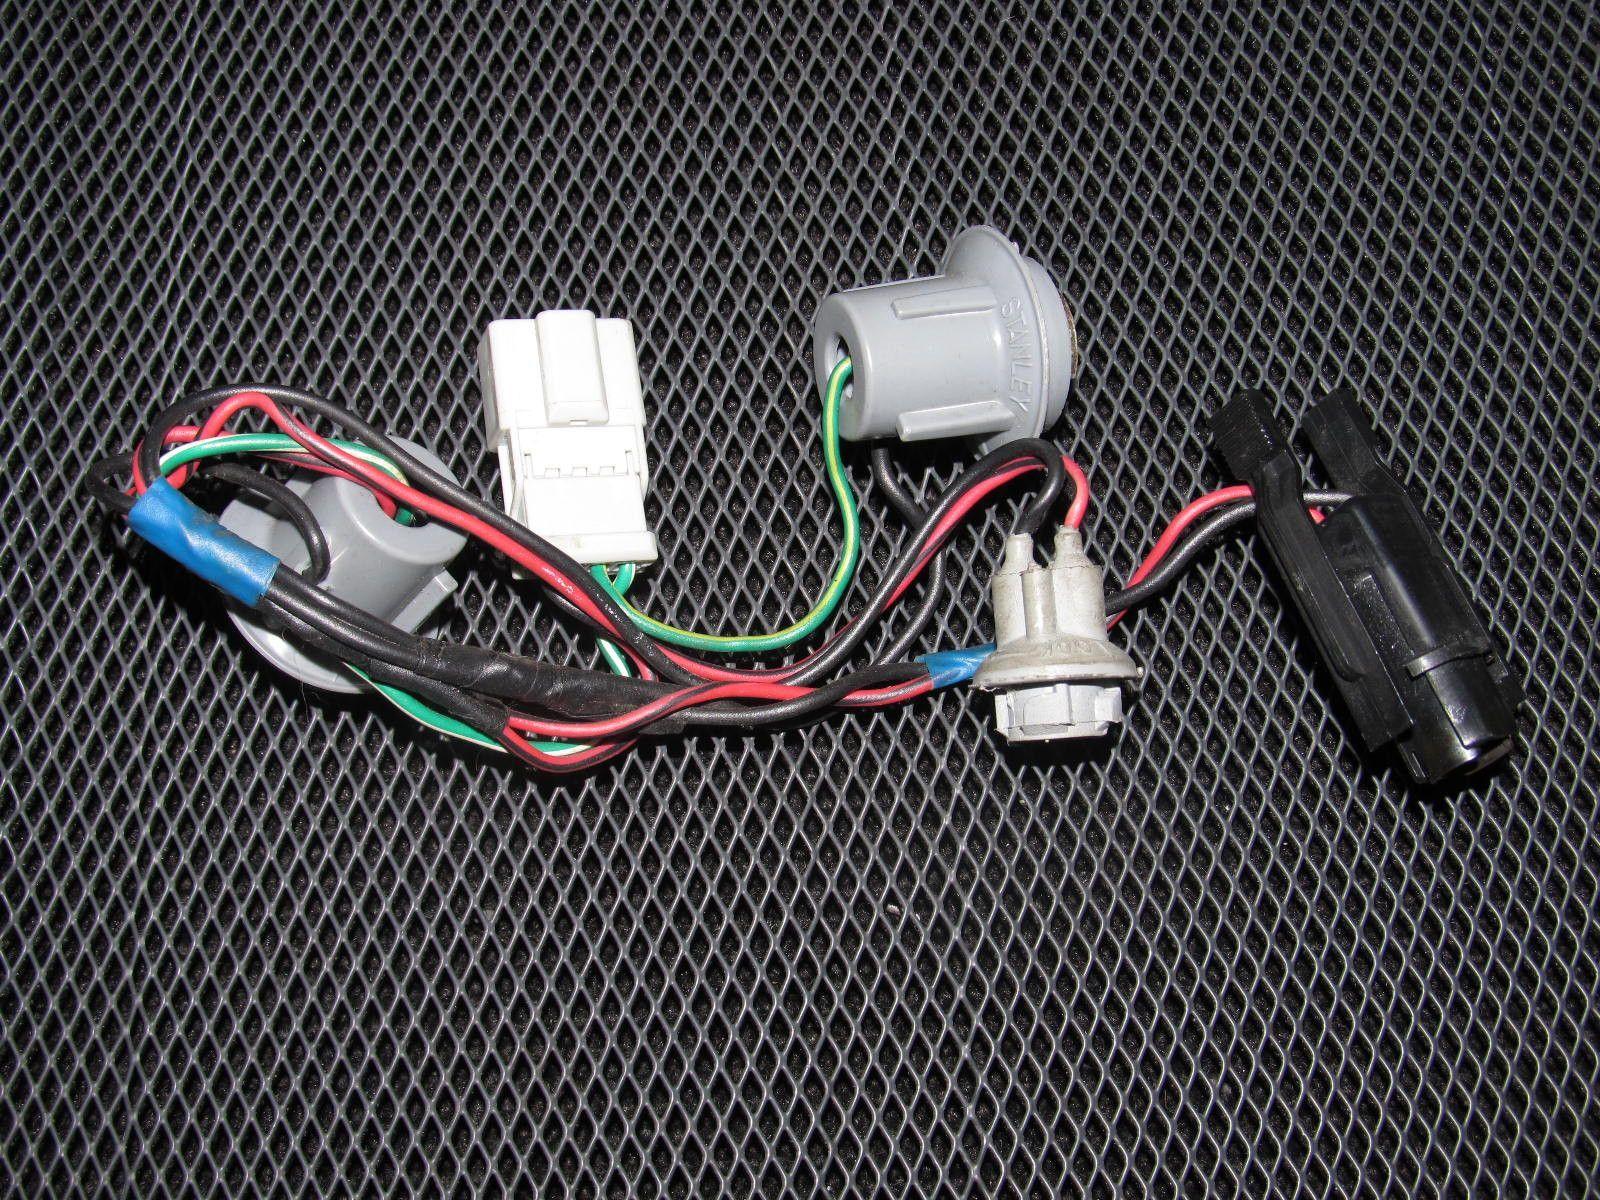 small resolution of 88 91 honda crx oem tail light bulb socket harness